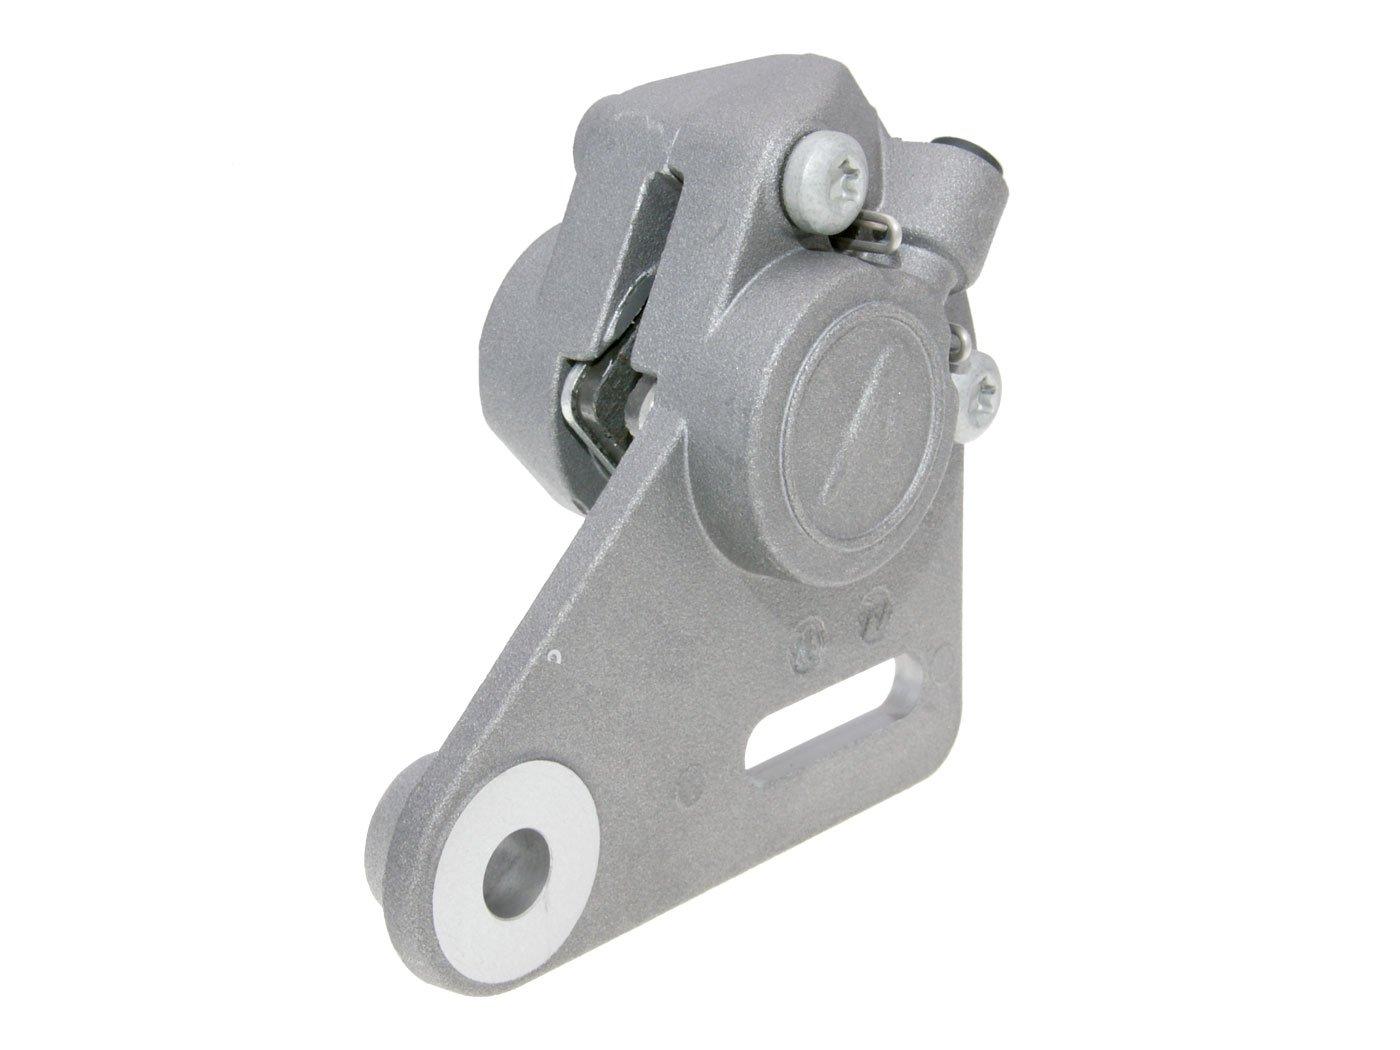 Bremssattel OEM 25mm hinten f/ür Derbi Senda 04- Gilera SMT Aprilia RX 50 06- SX 50